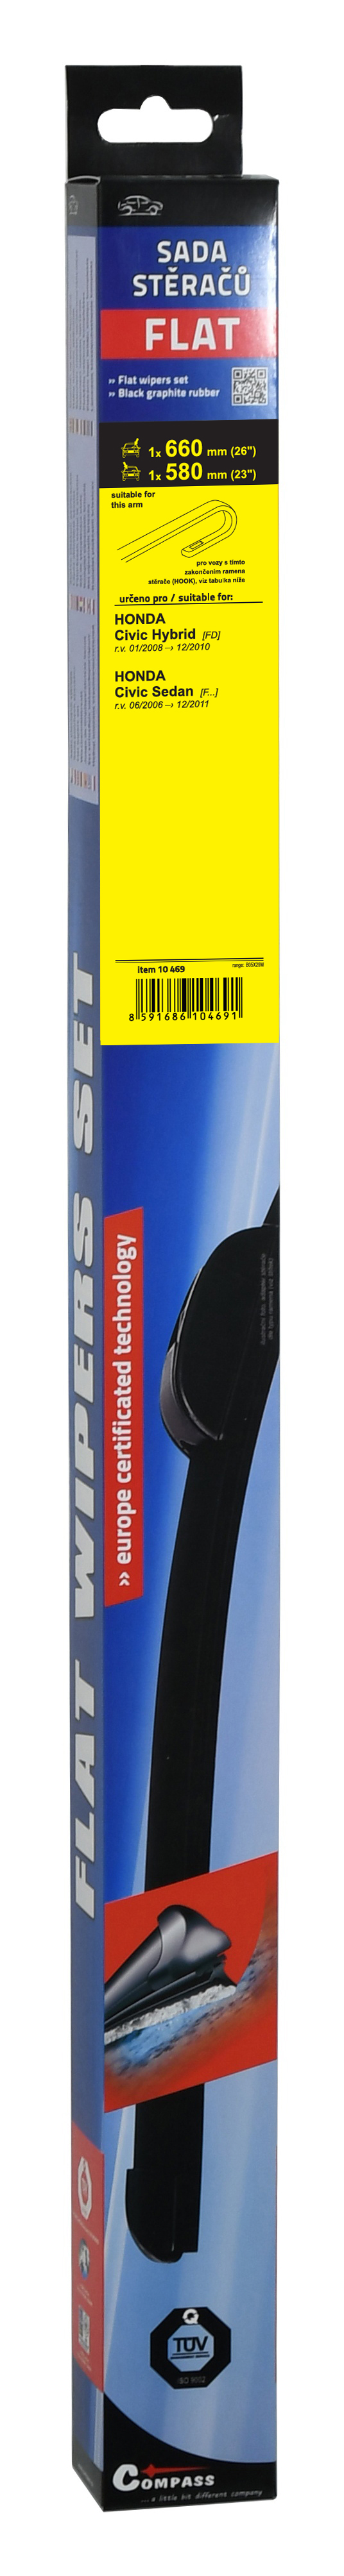 Stěrače FLAT SET (HOOK) 660+580mm